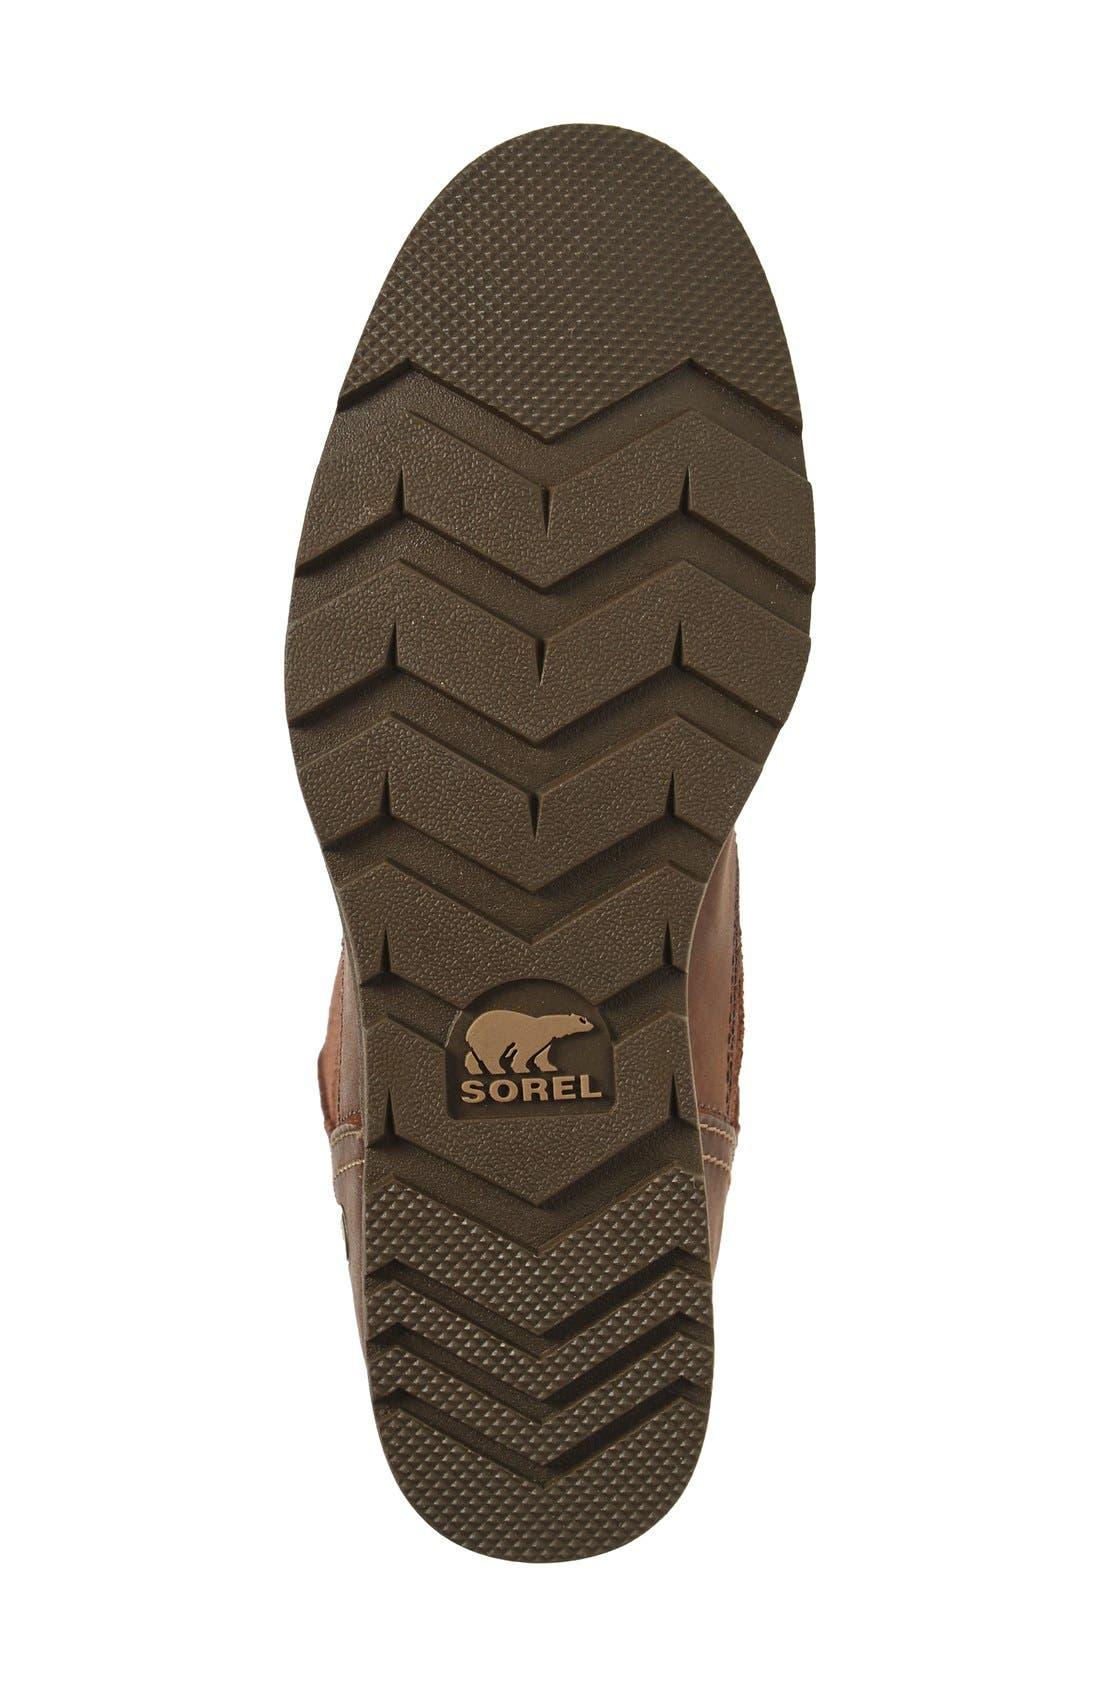 'Major' Boot,                             Alternate thumbnail 4, color,                             200